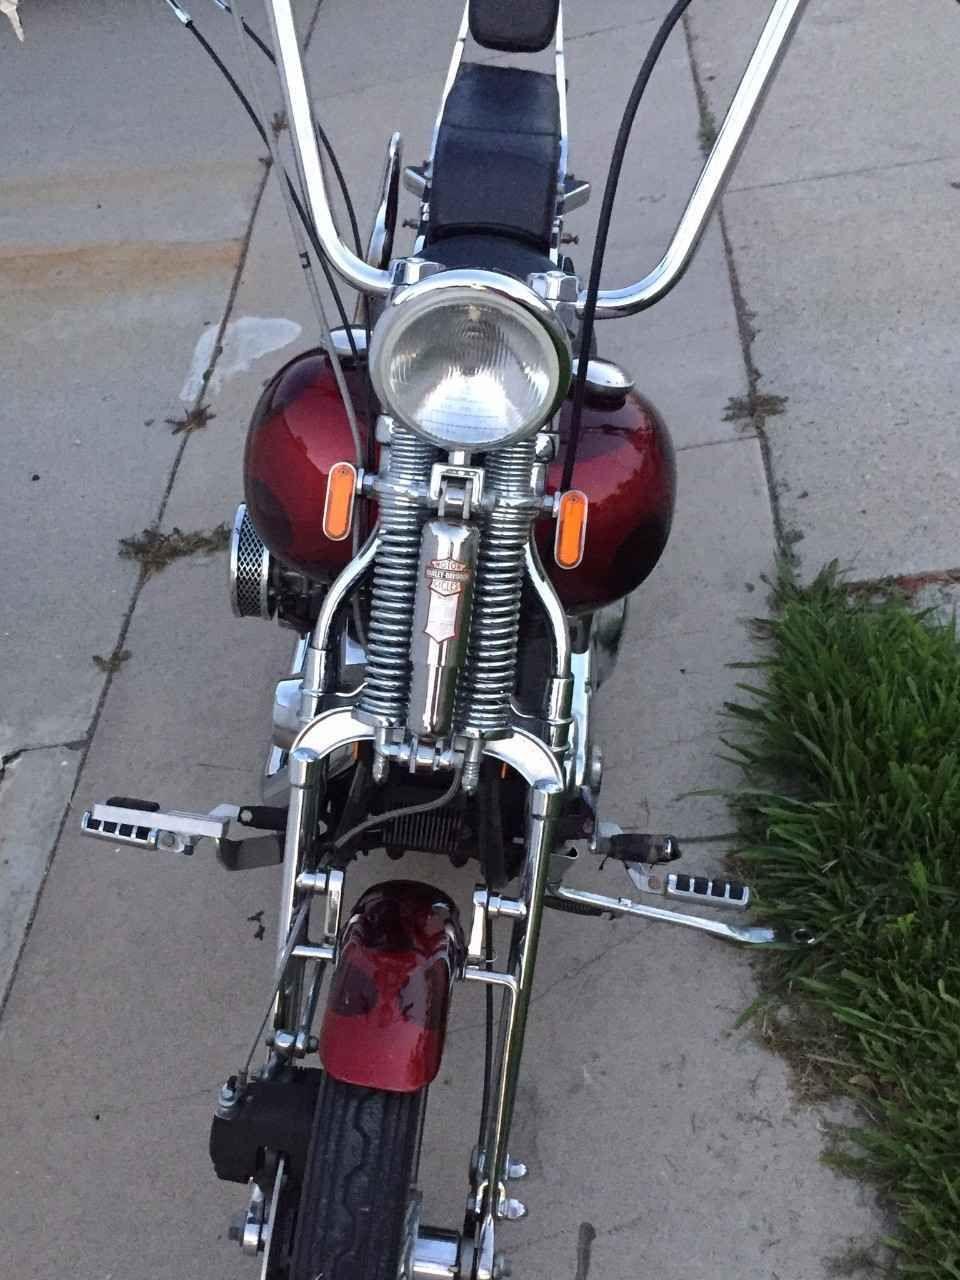 1992 Harley Davidson Springer Softail Softail Harley Davidson Harley [ 1280 x 960 Pixel ]